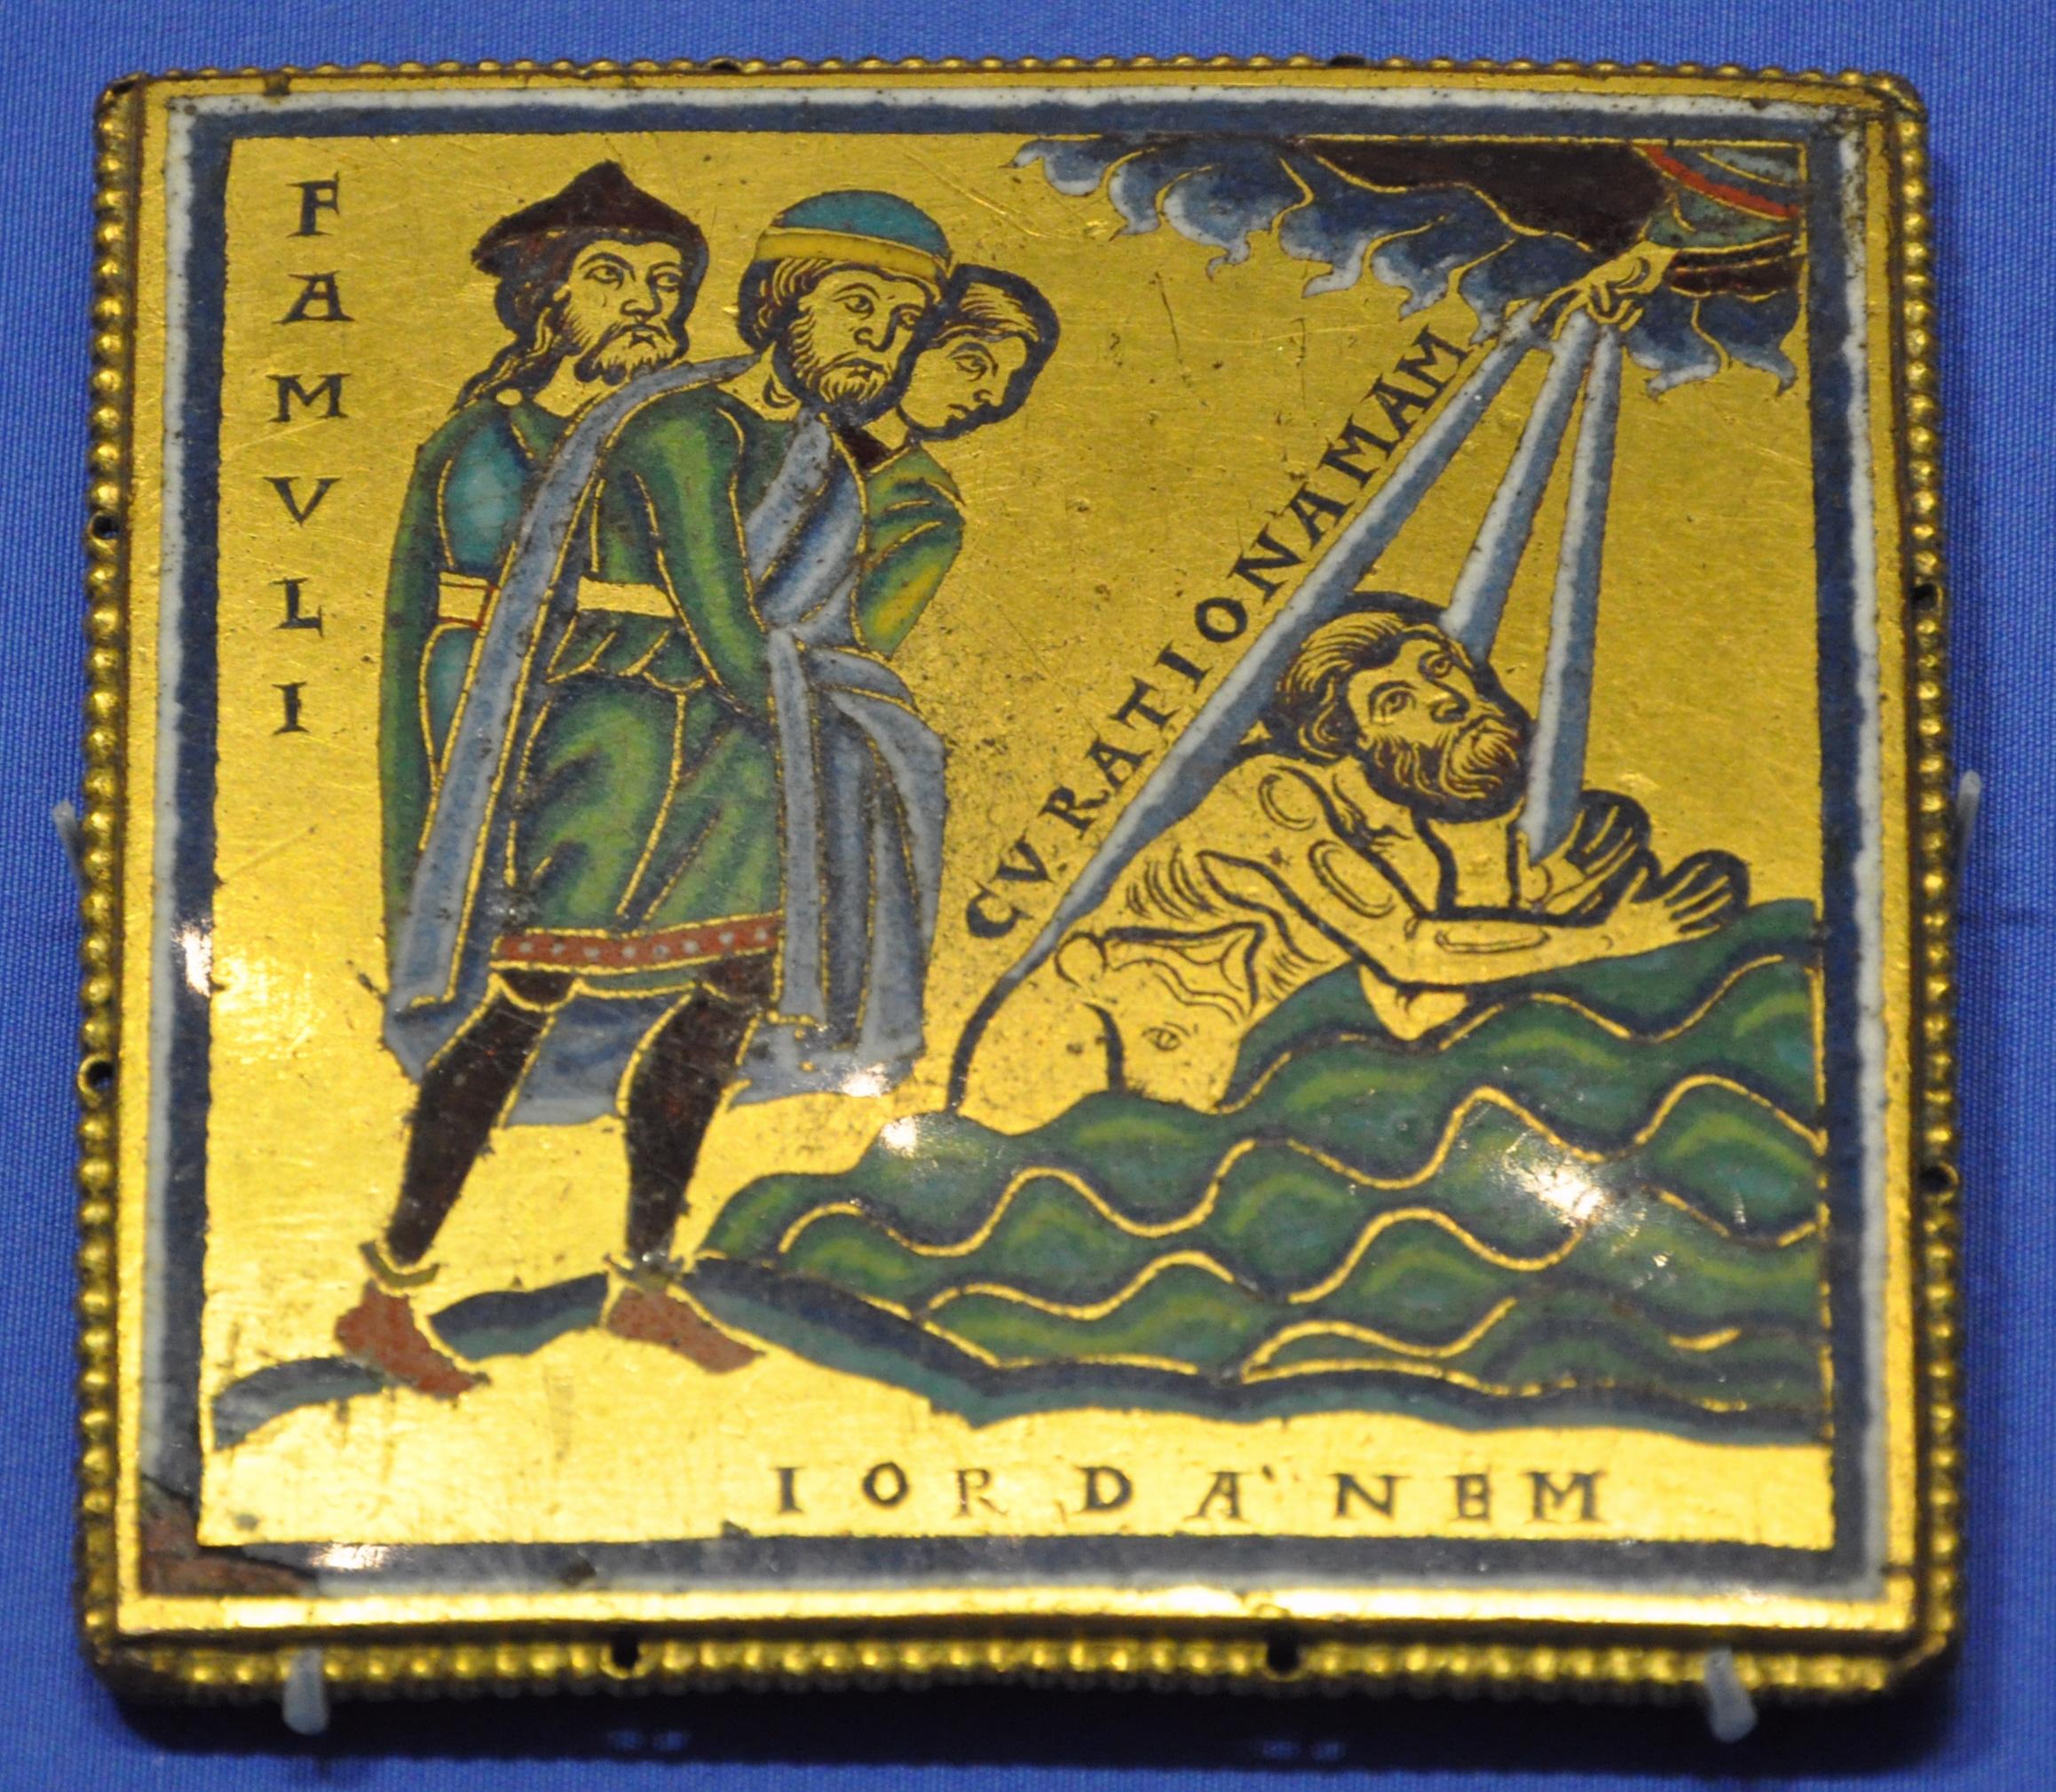 https://upload.wikimedia.org/wikipedia/commons/c/c7/Enamel_plaque_Naaman_BM.jpg